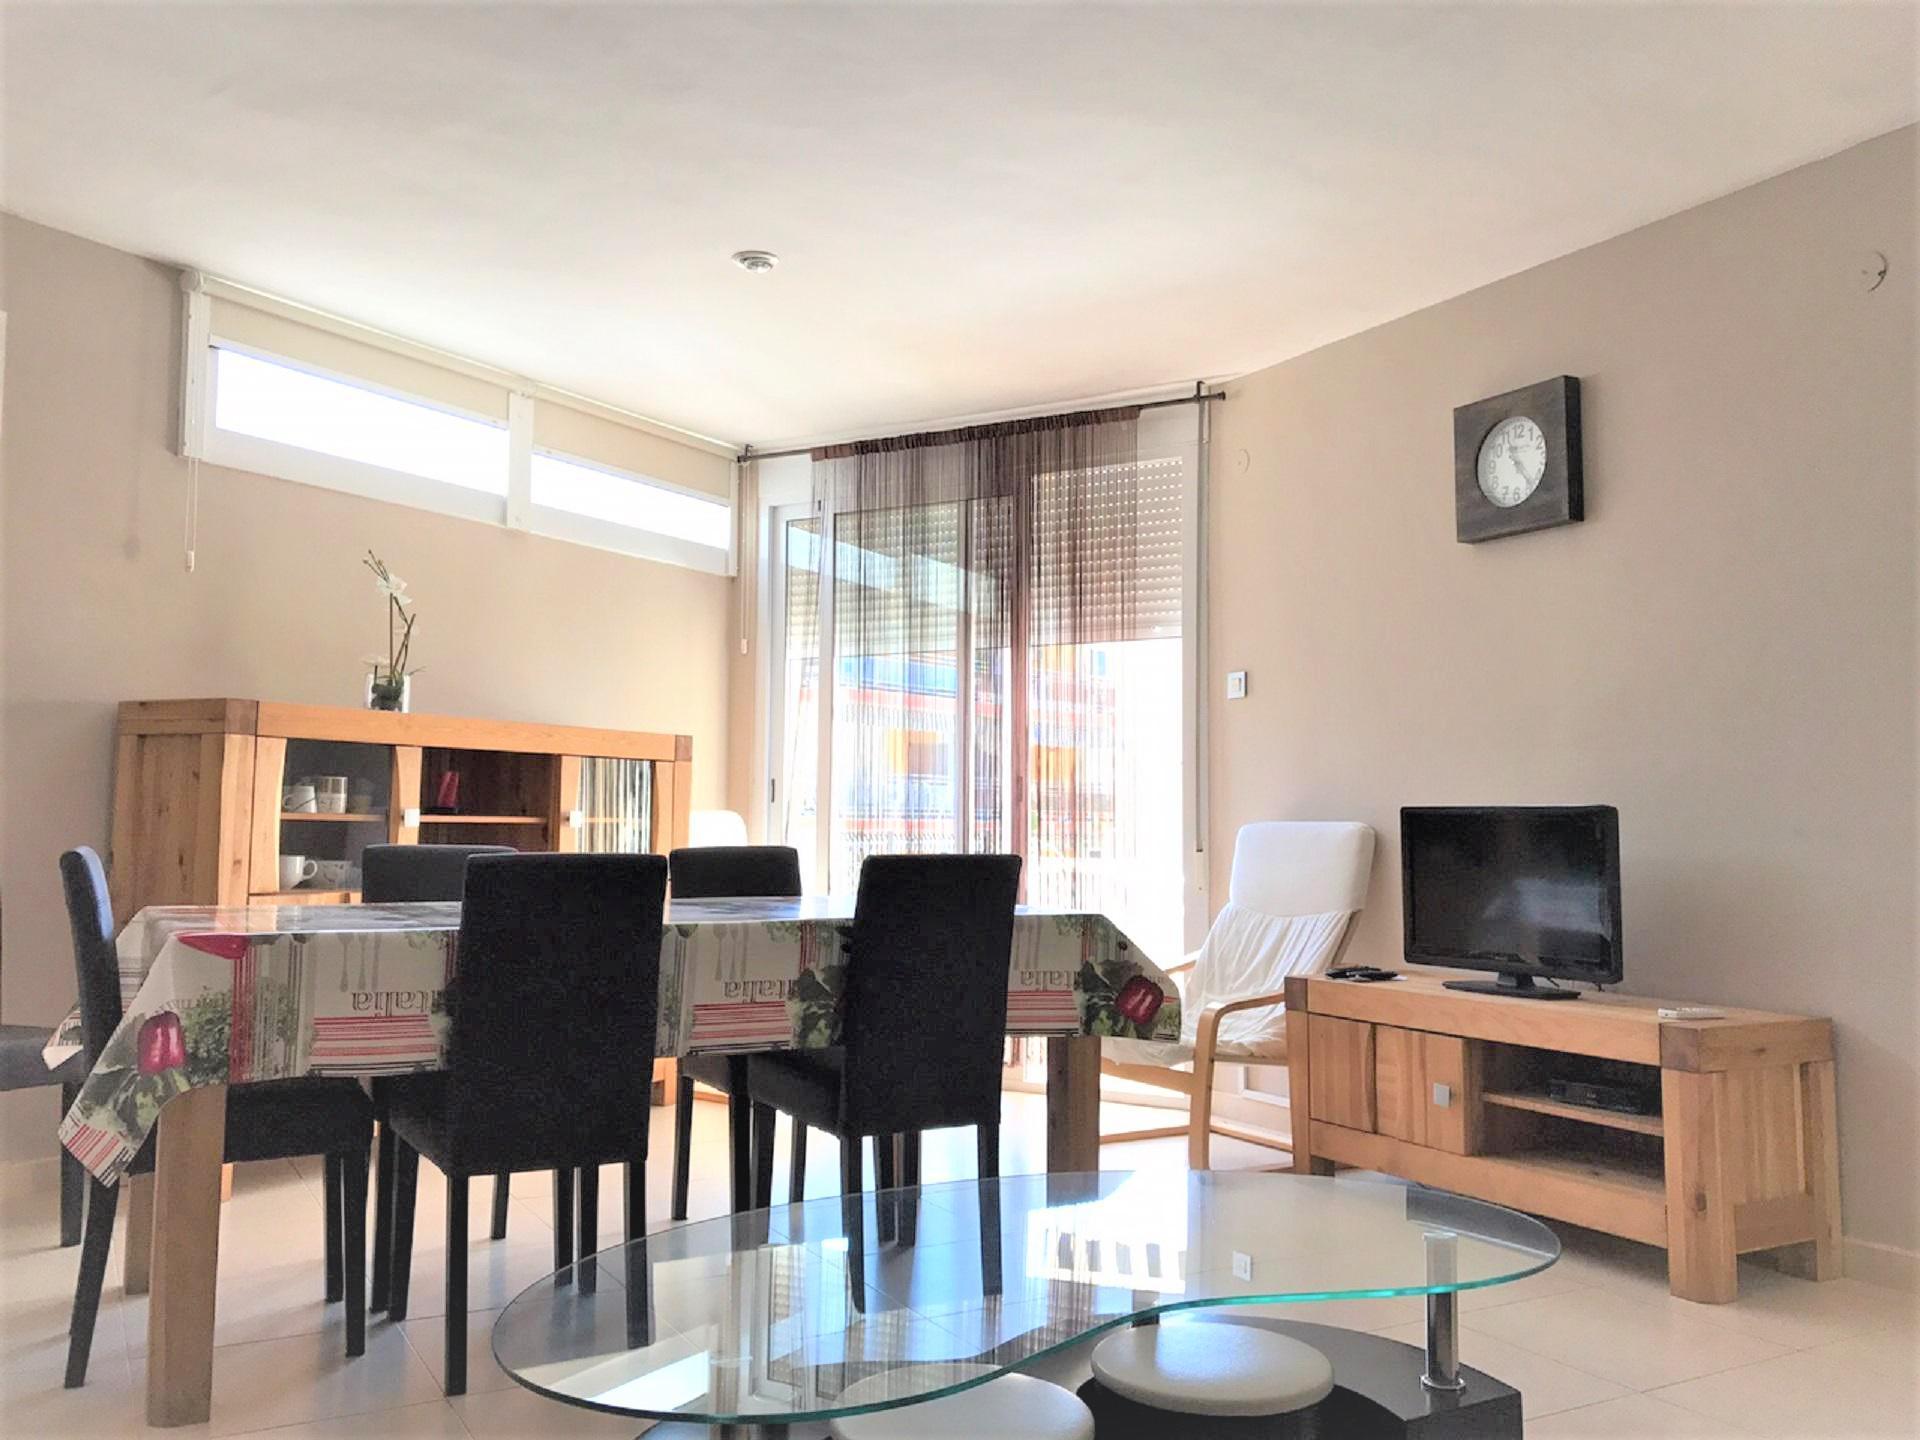 Apartamento -                                       Cambrils -                                       2 dormitorios -                                       5 ocupantes